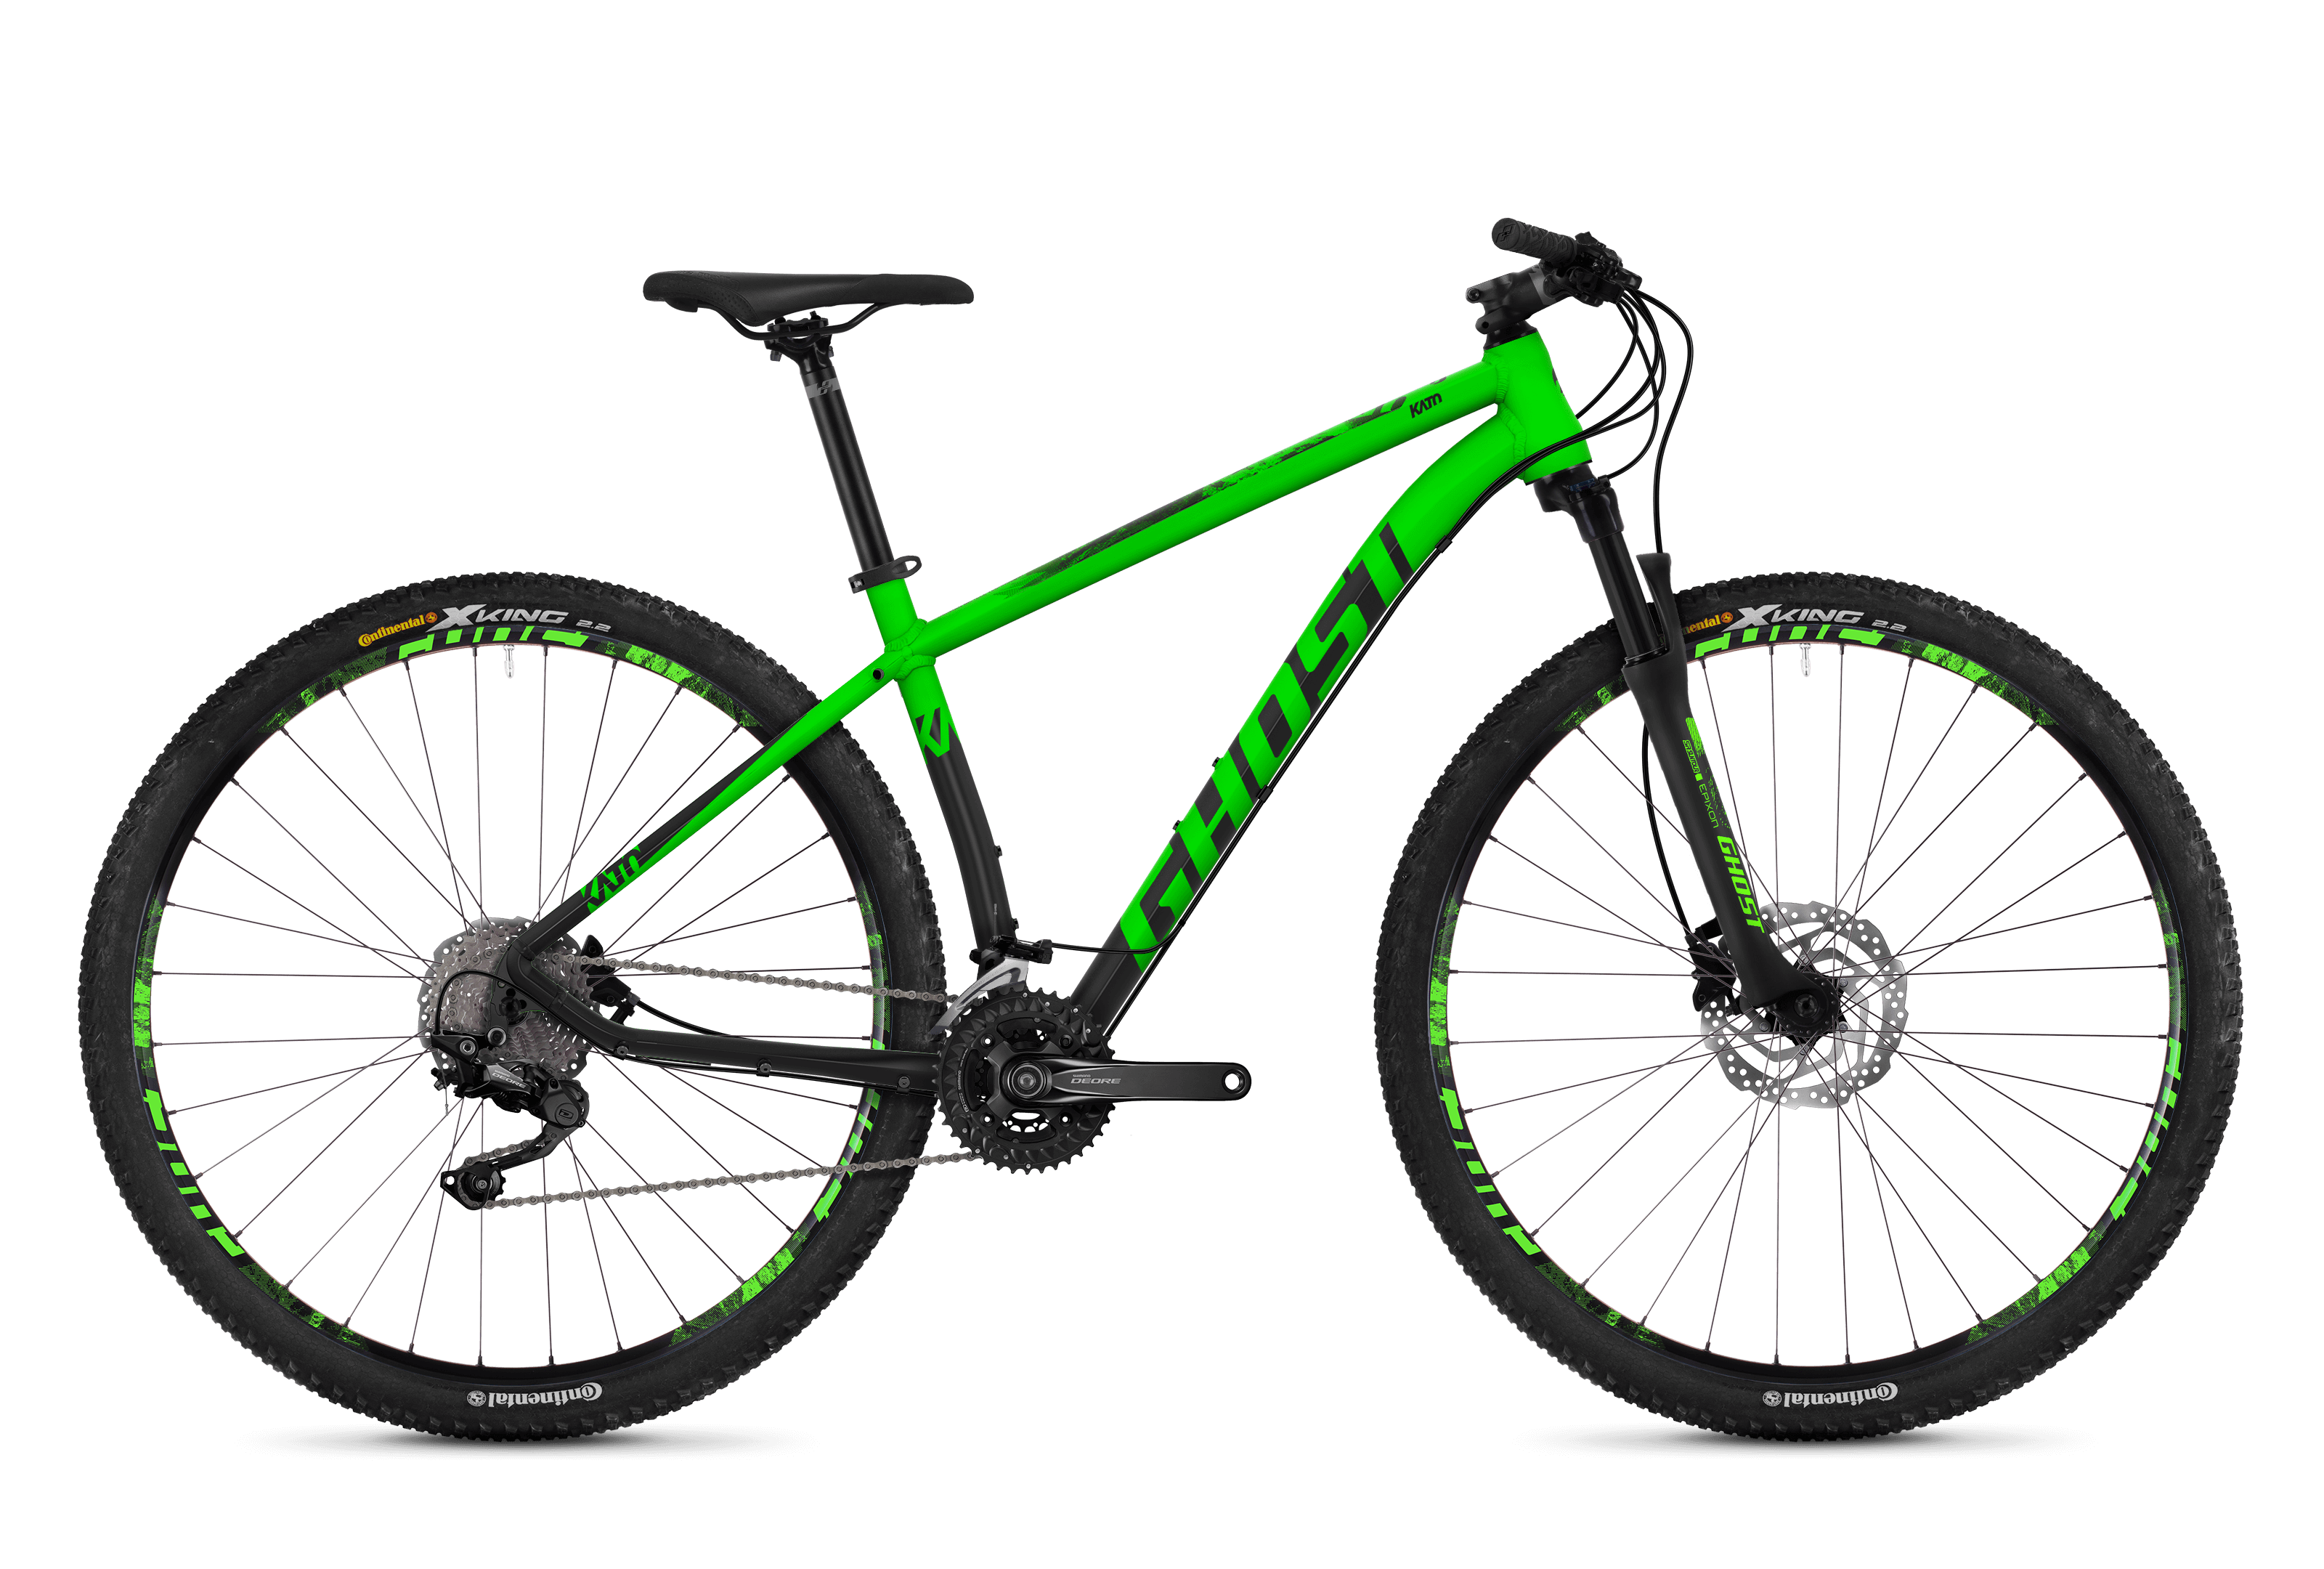 Horské kolo GHOST Kato 6.9 green / black XL 2018